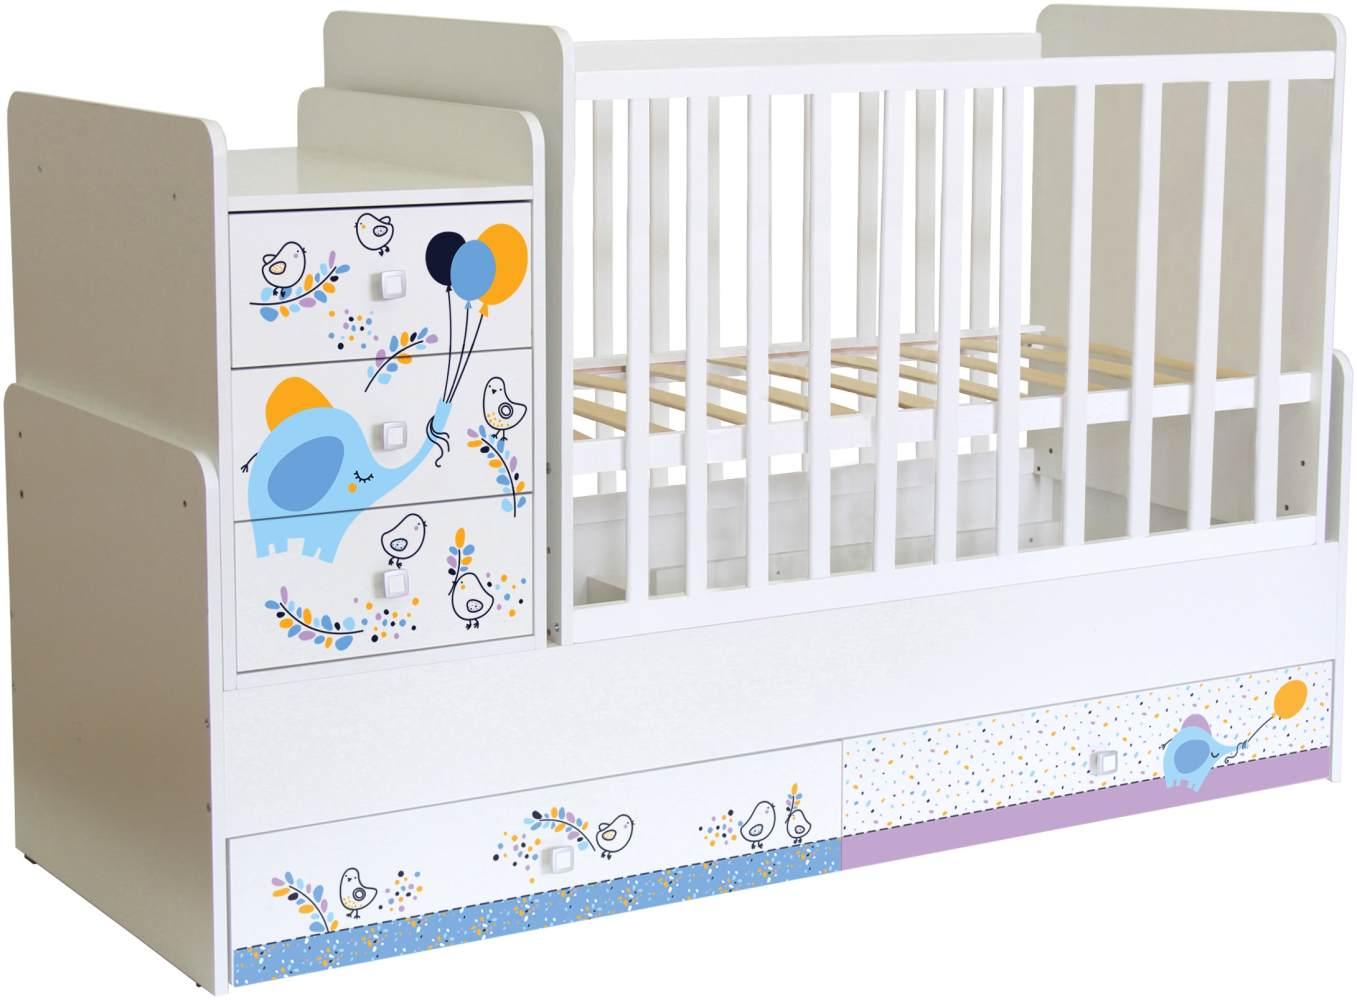 Polini Kids 'Simple 1100' Kombi-Kinderbett 60 x 120/170 cm, weiß, Elefant, höhenverstellbar, mit Schaukelfunktion, inkl. Kommode Bild 1